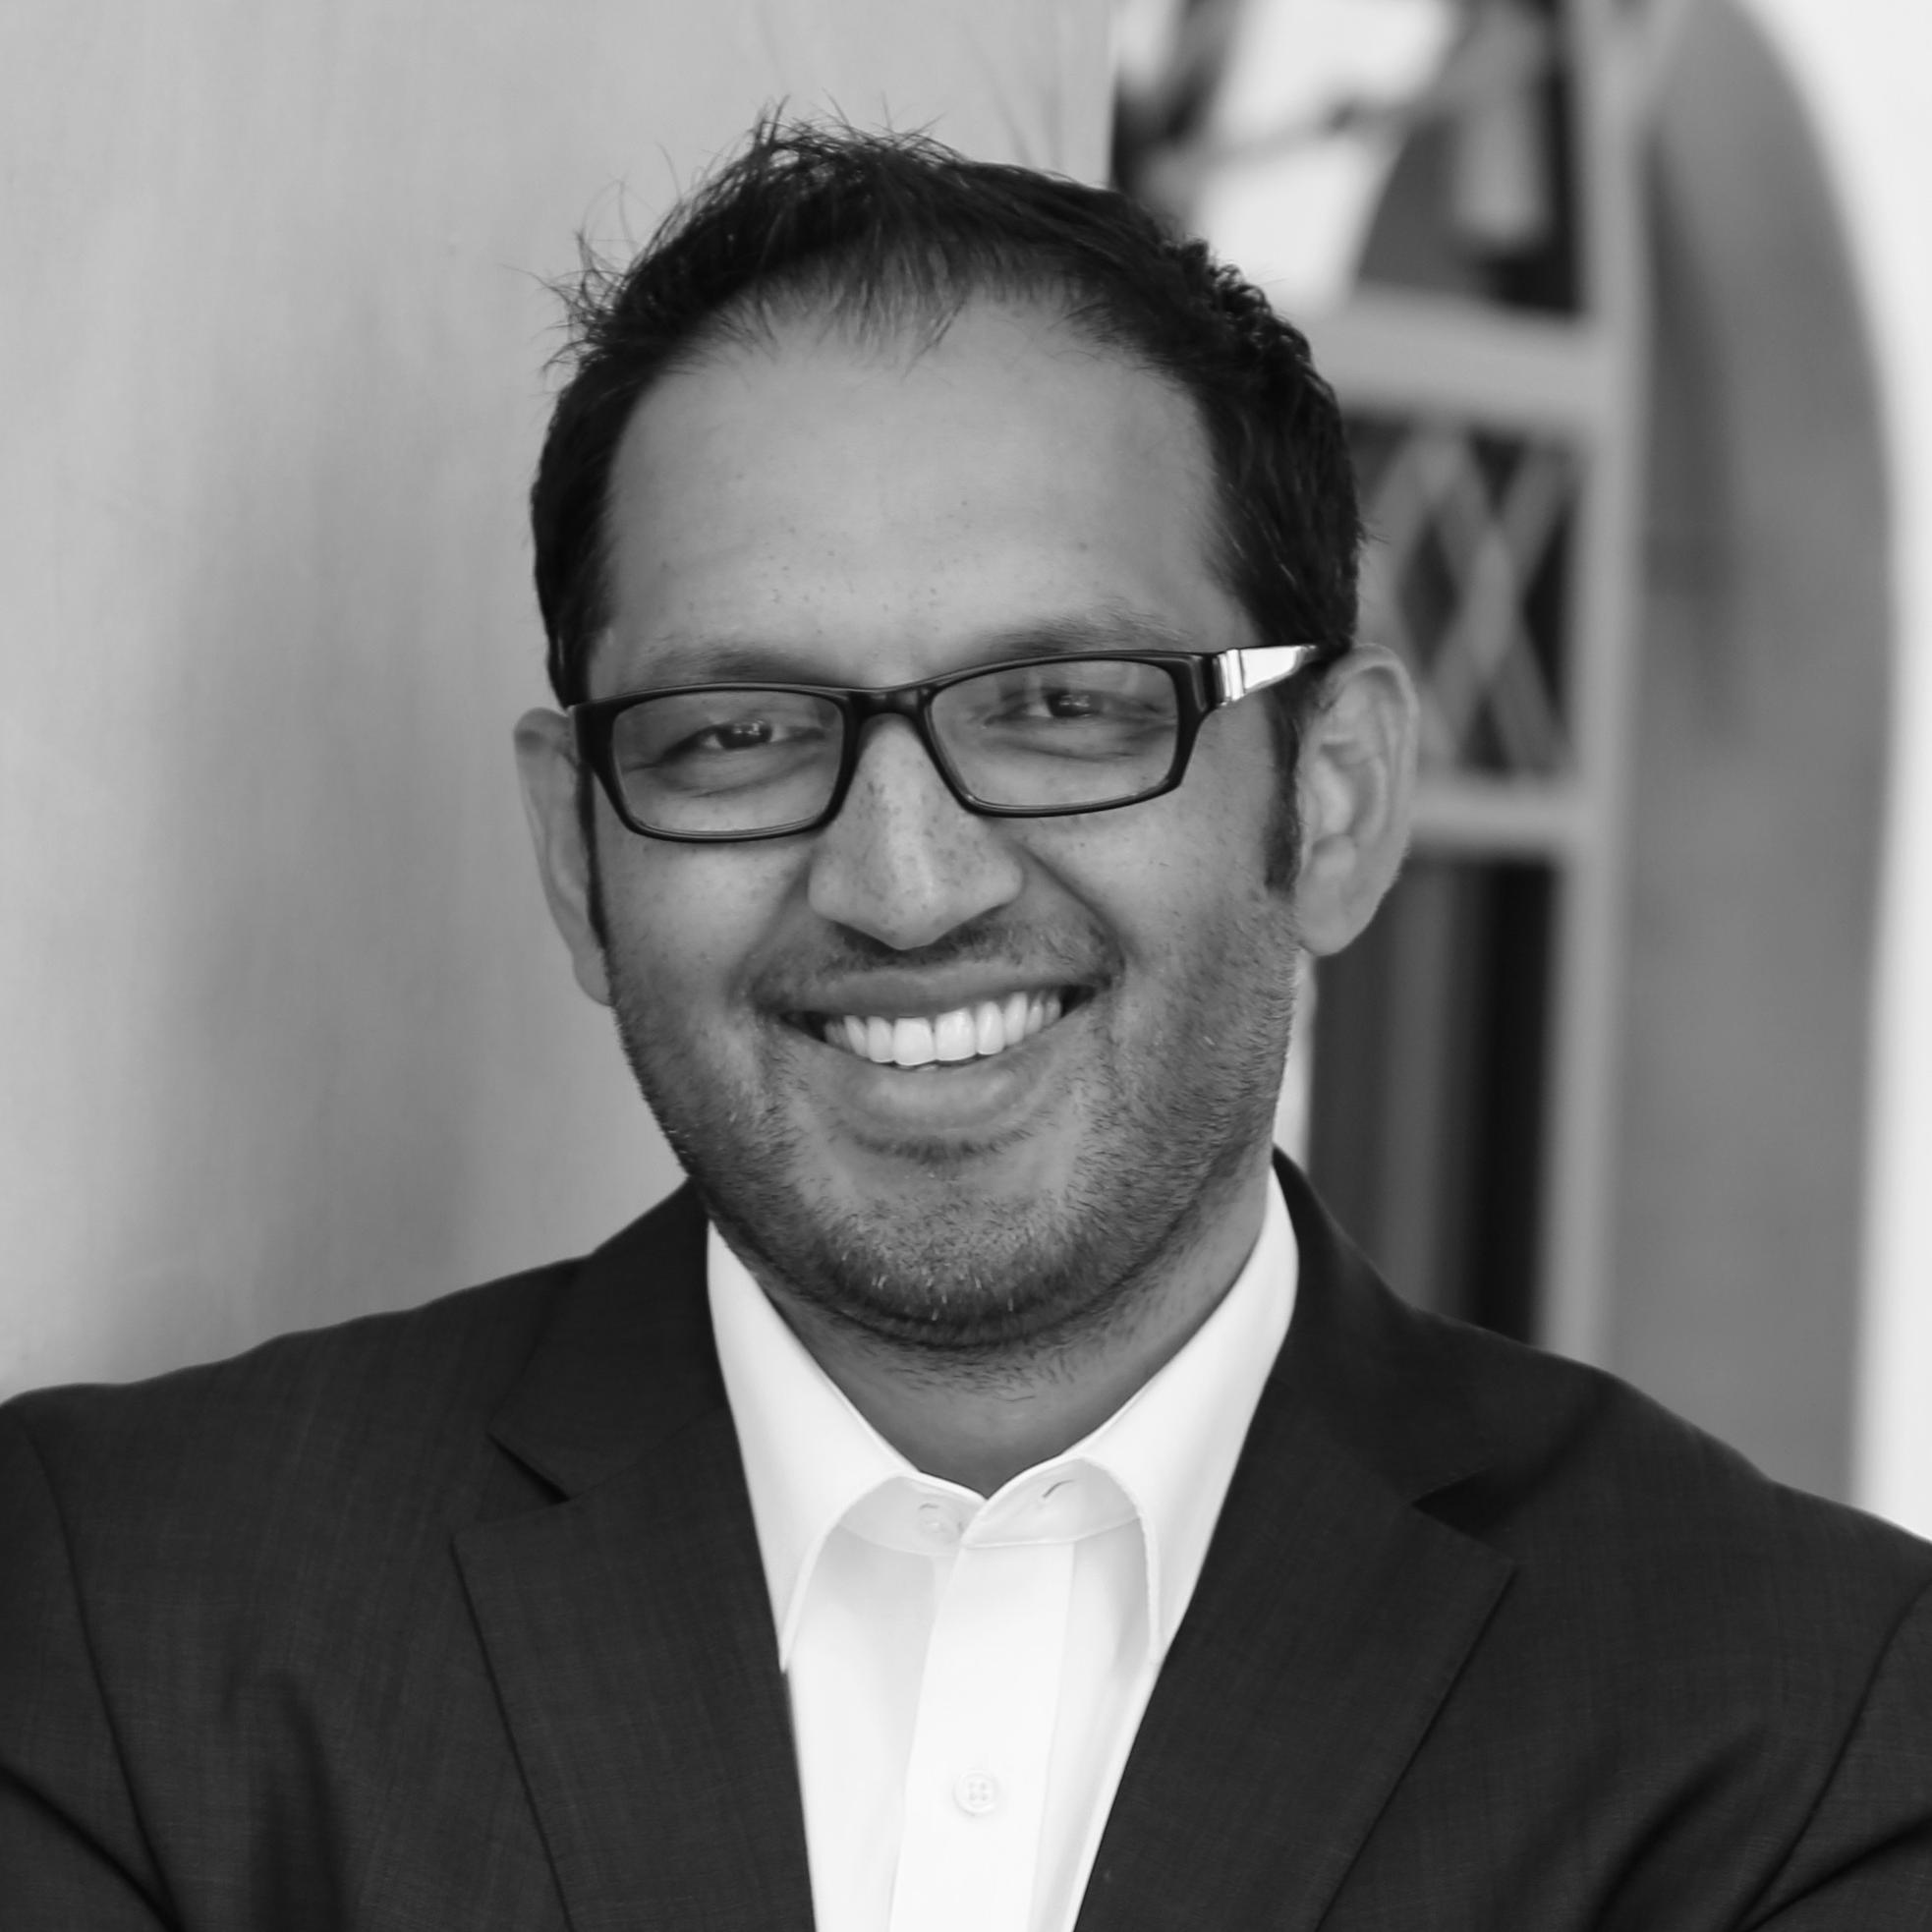 Umpqua Holdings Corporation Names Shawn Ahmed President and CEO of Pivotus, Inc. thumbnail